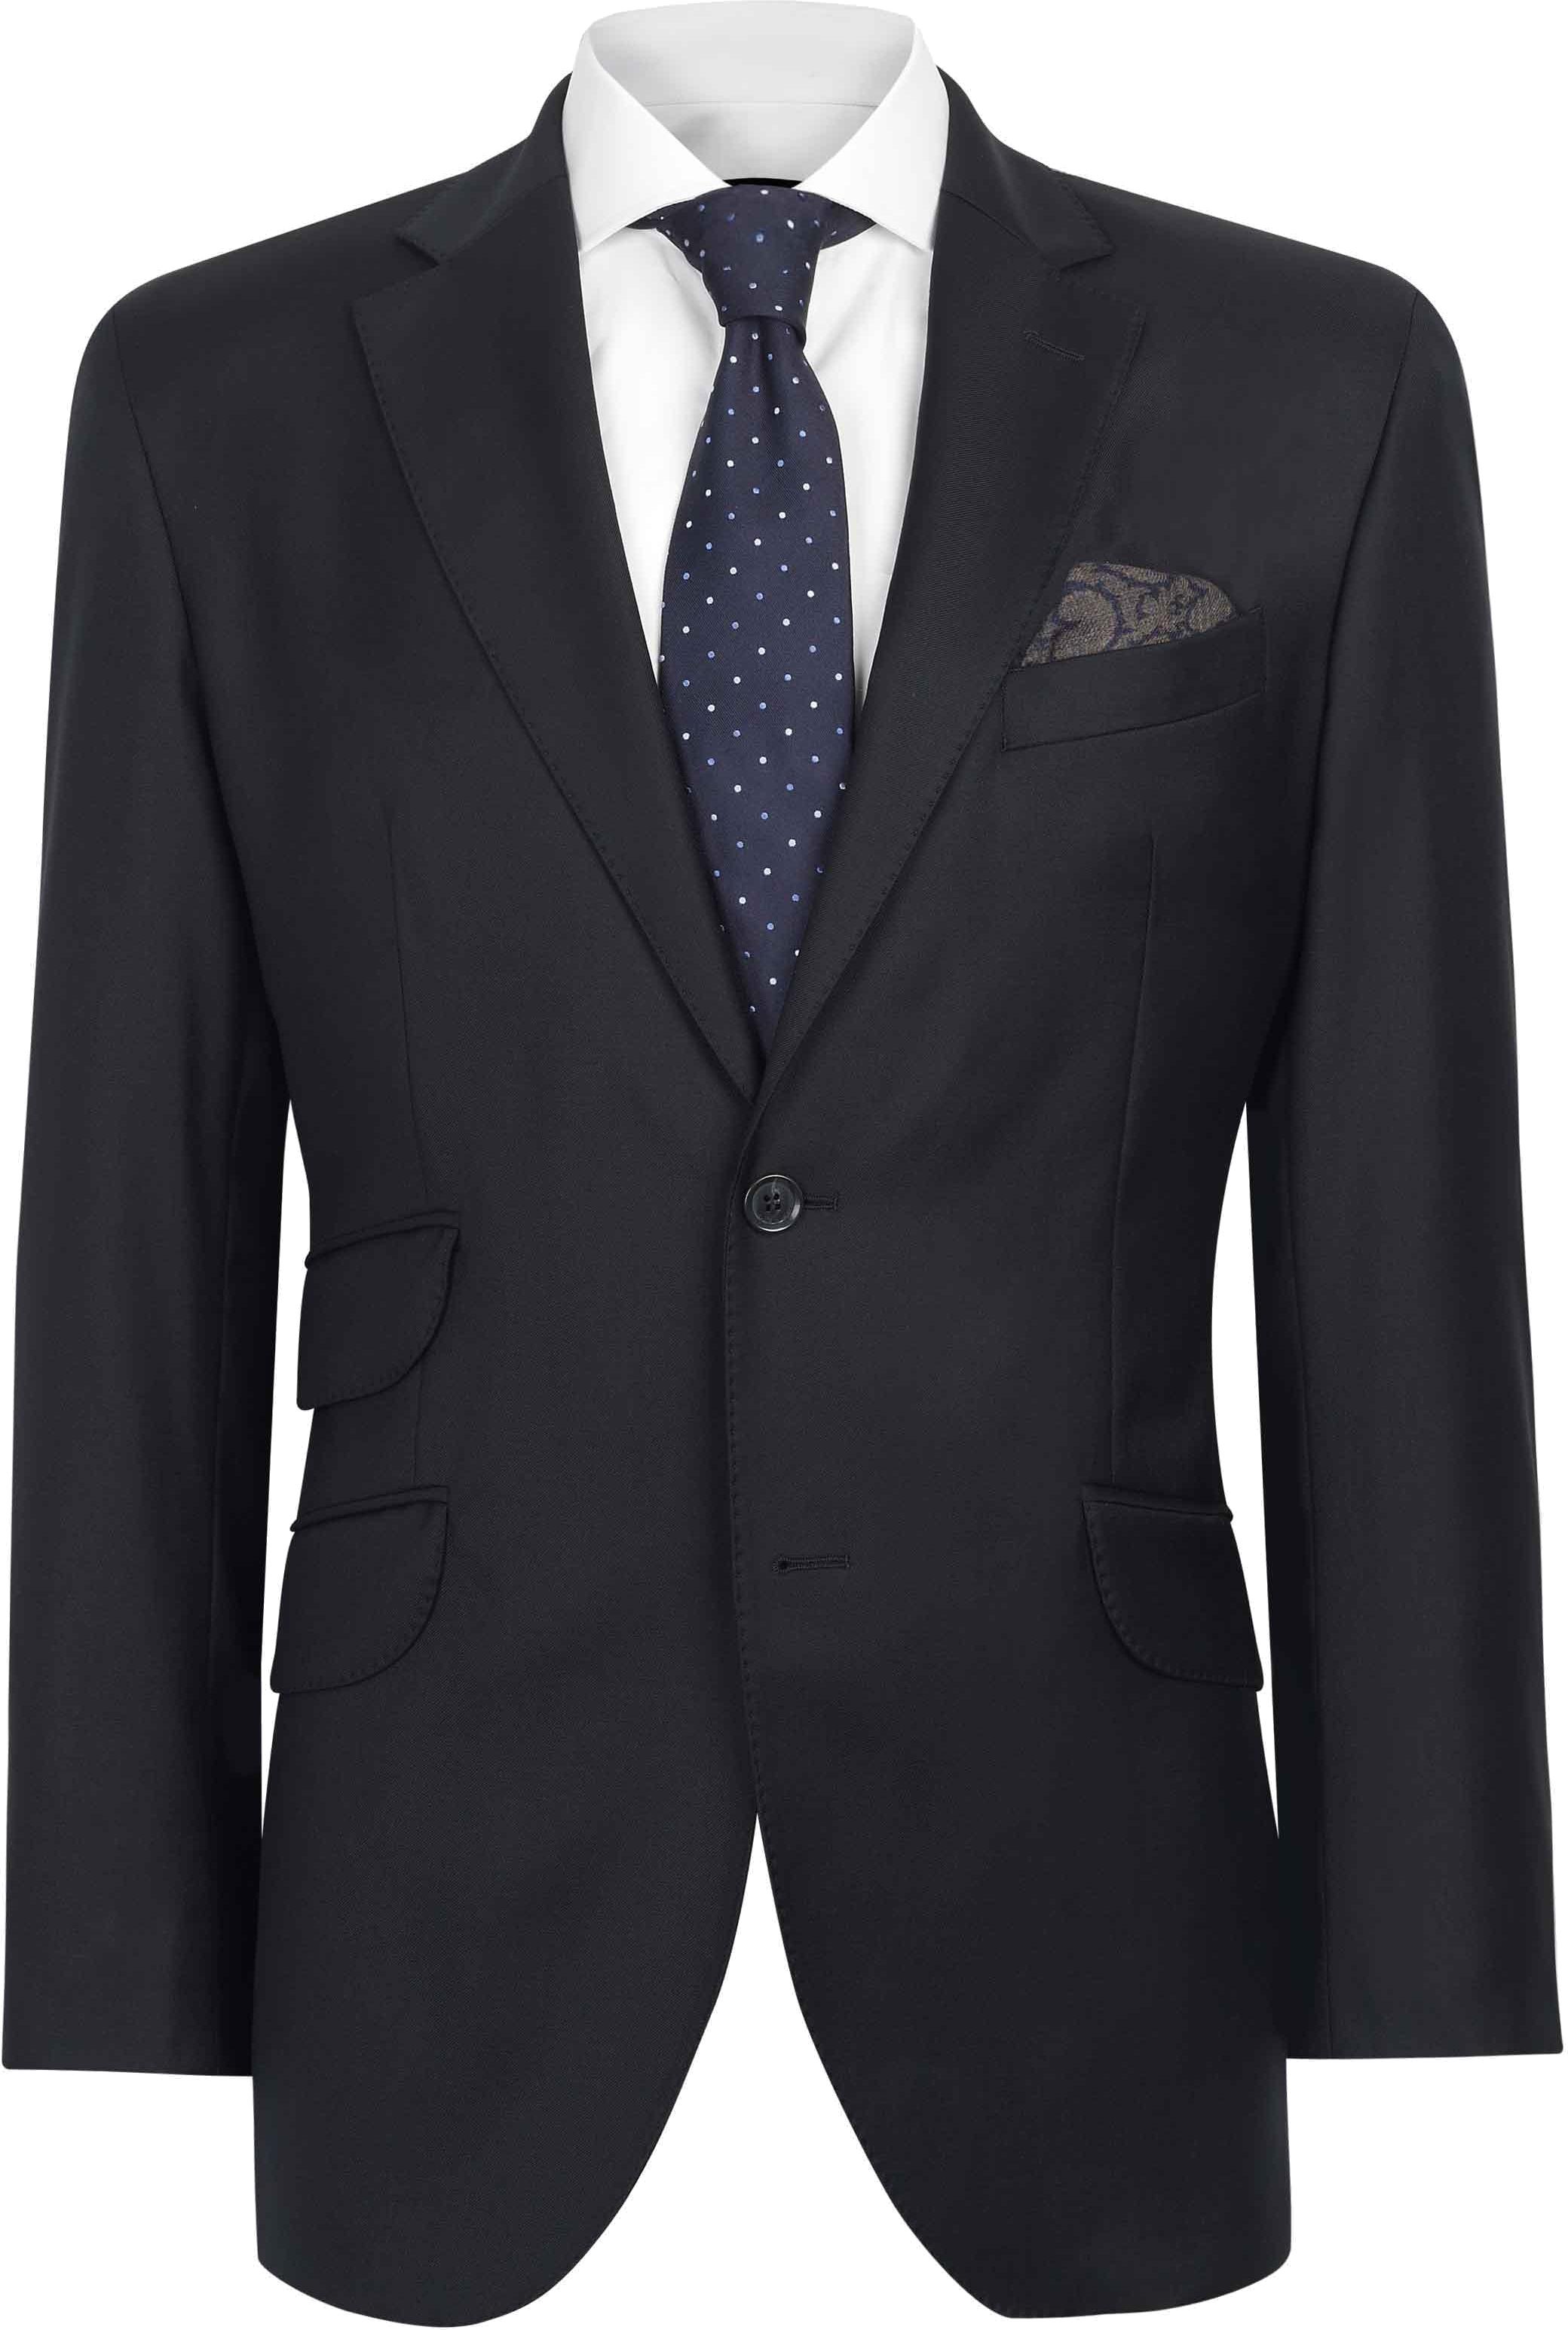 Clipart pants business. Suit png images free